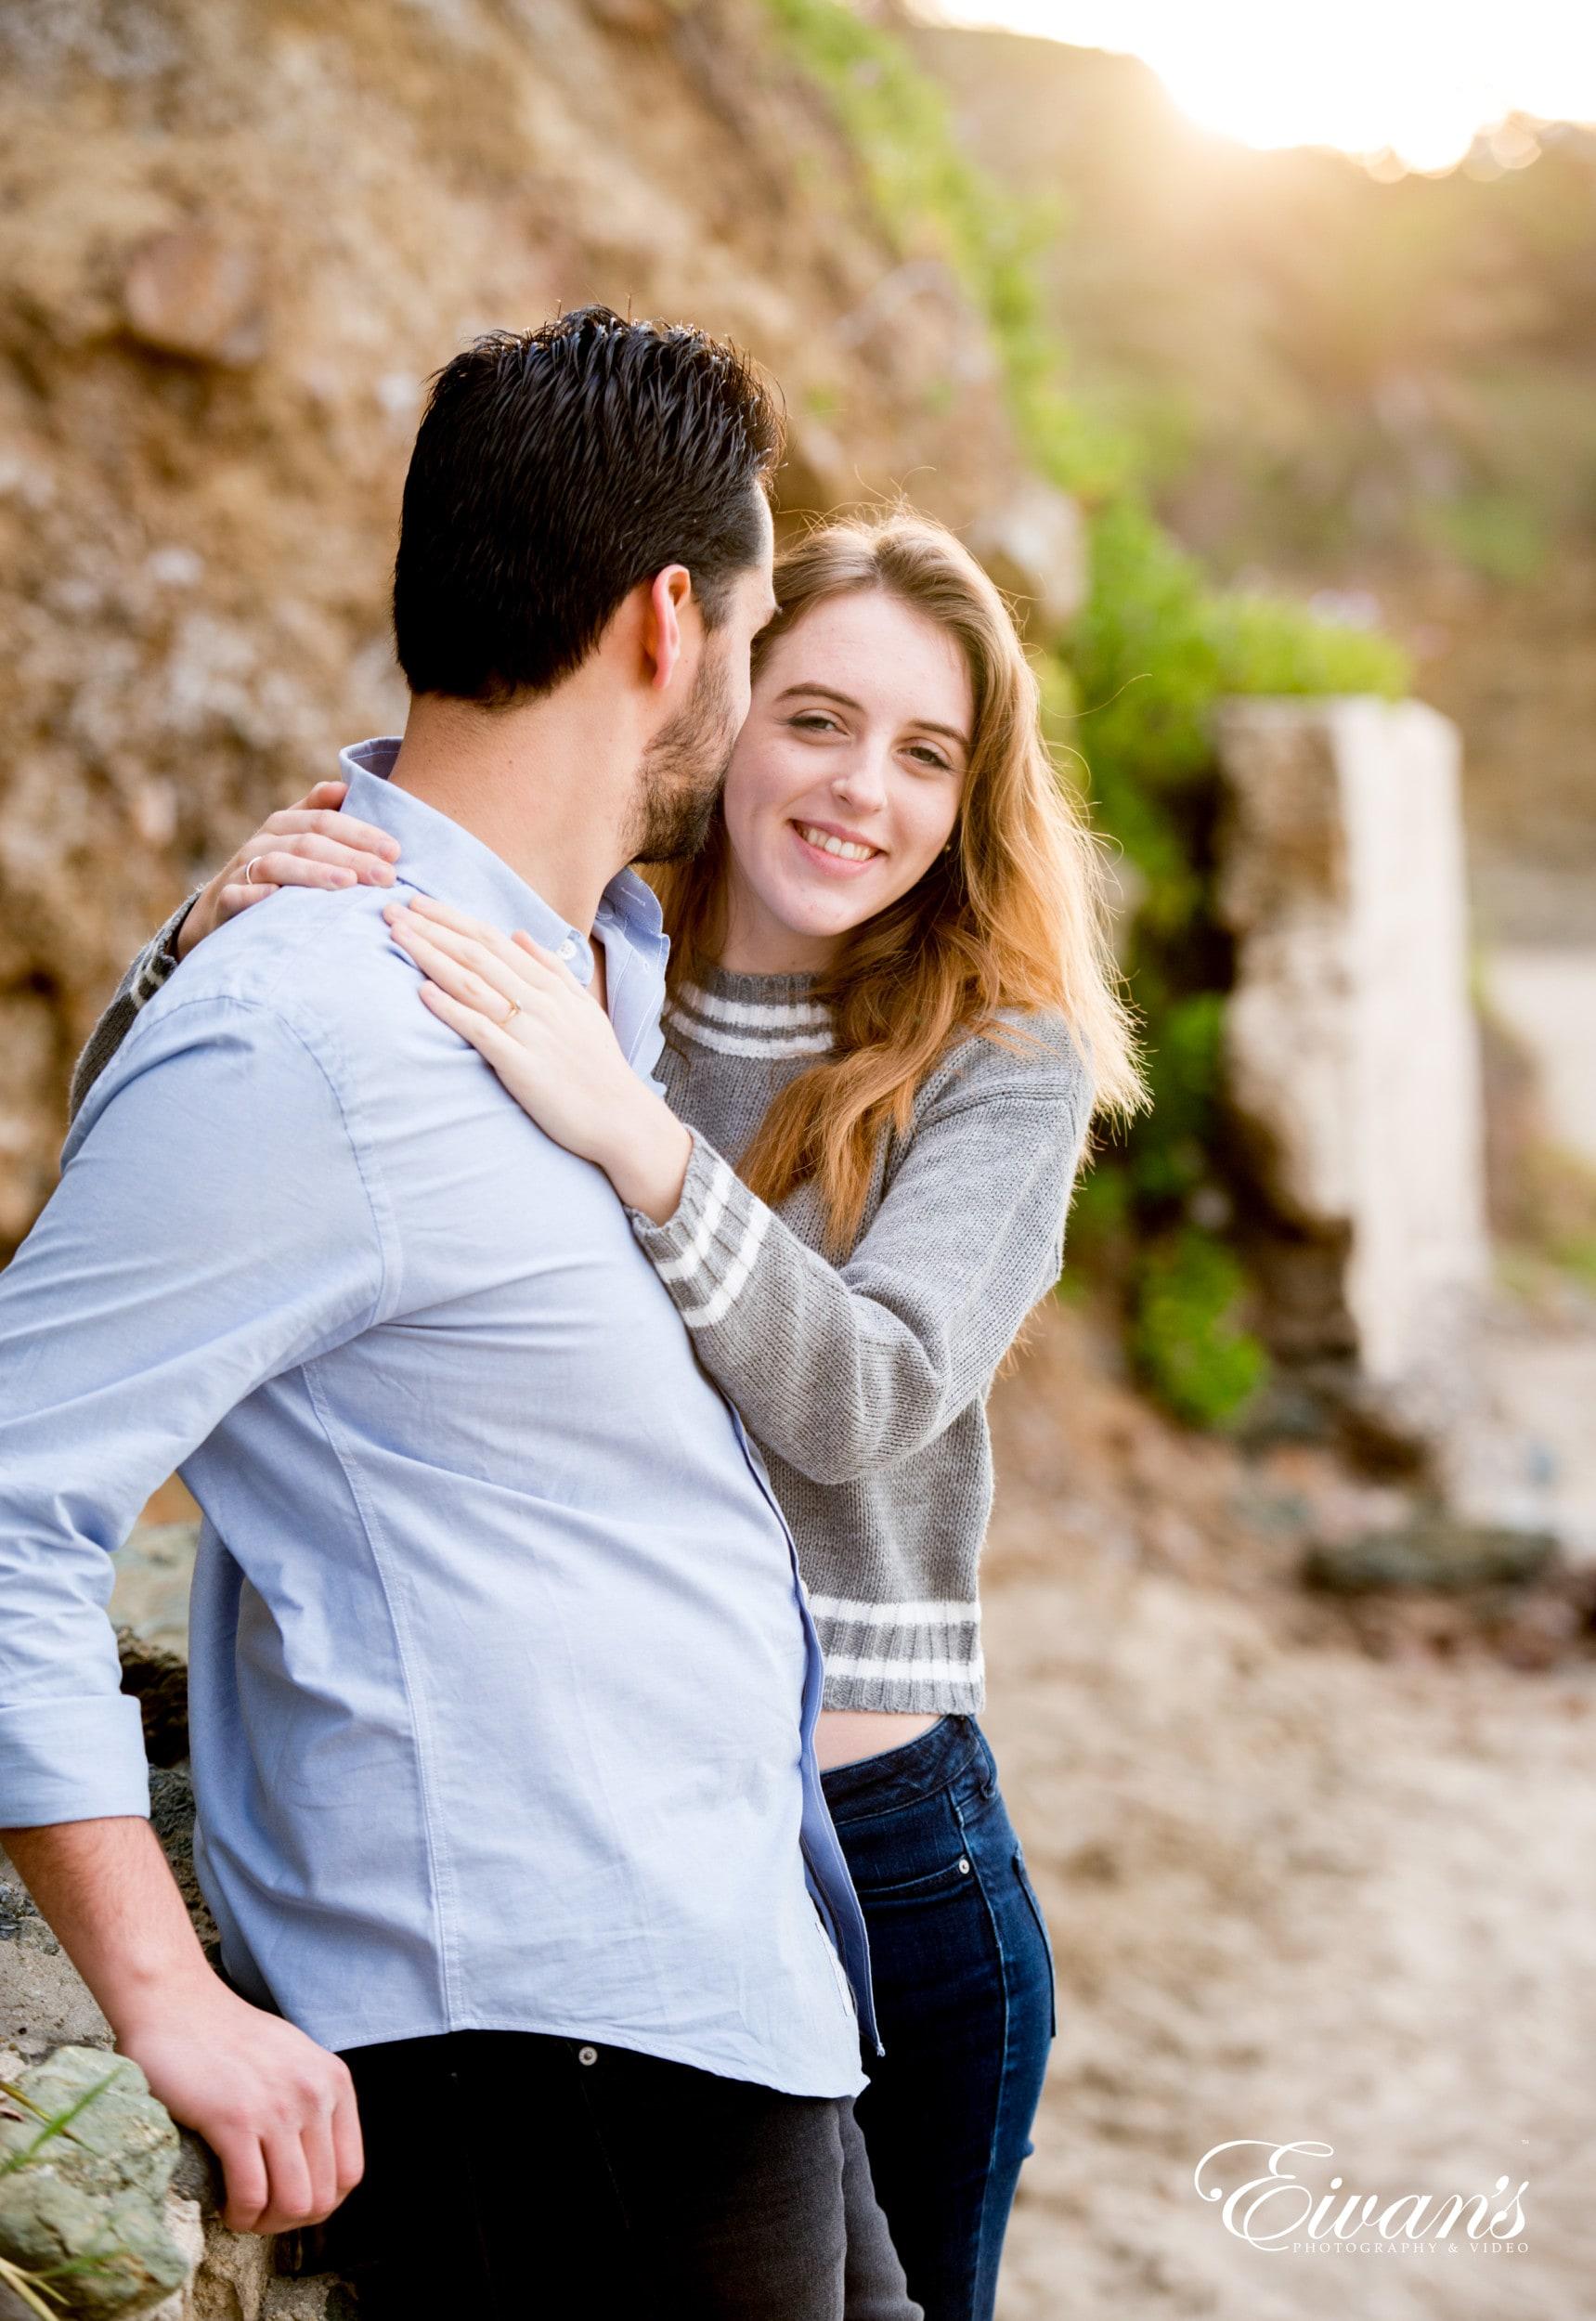 man in gray long sleeve shirt hugging woman in gray long sleeve shirt